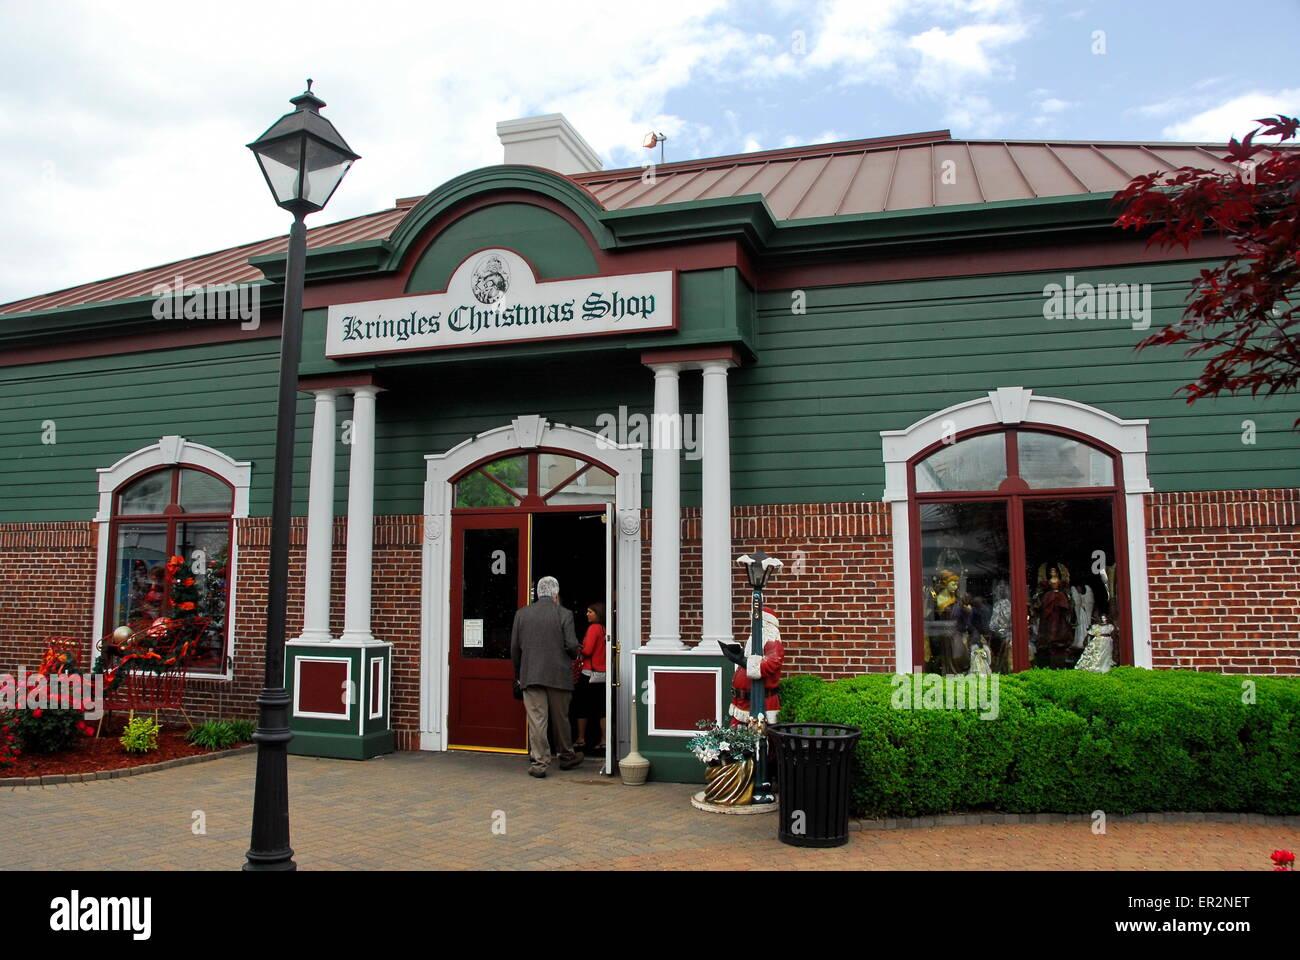 Kringles For Christmas.Kringles Christmas Shop In Grand Village Shopping Center In